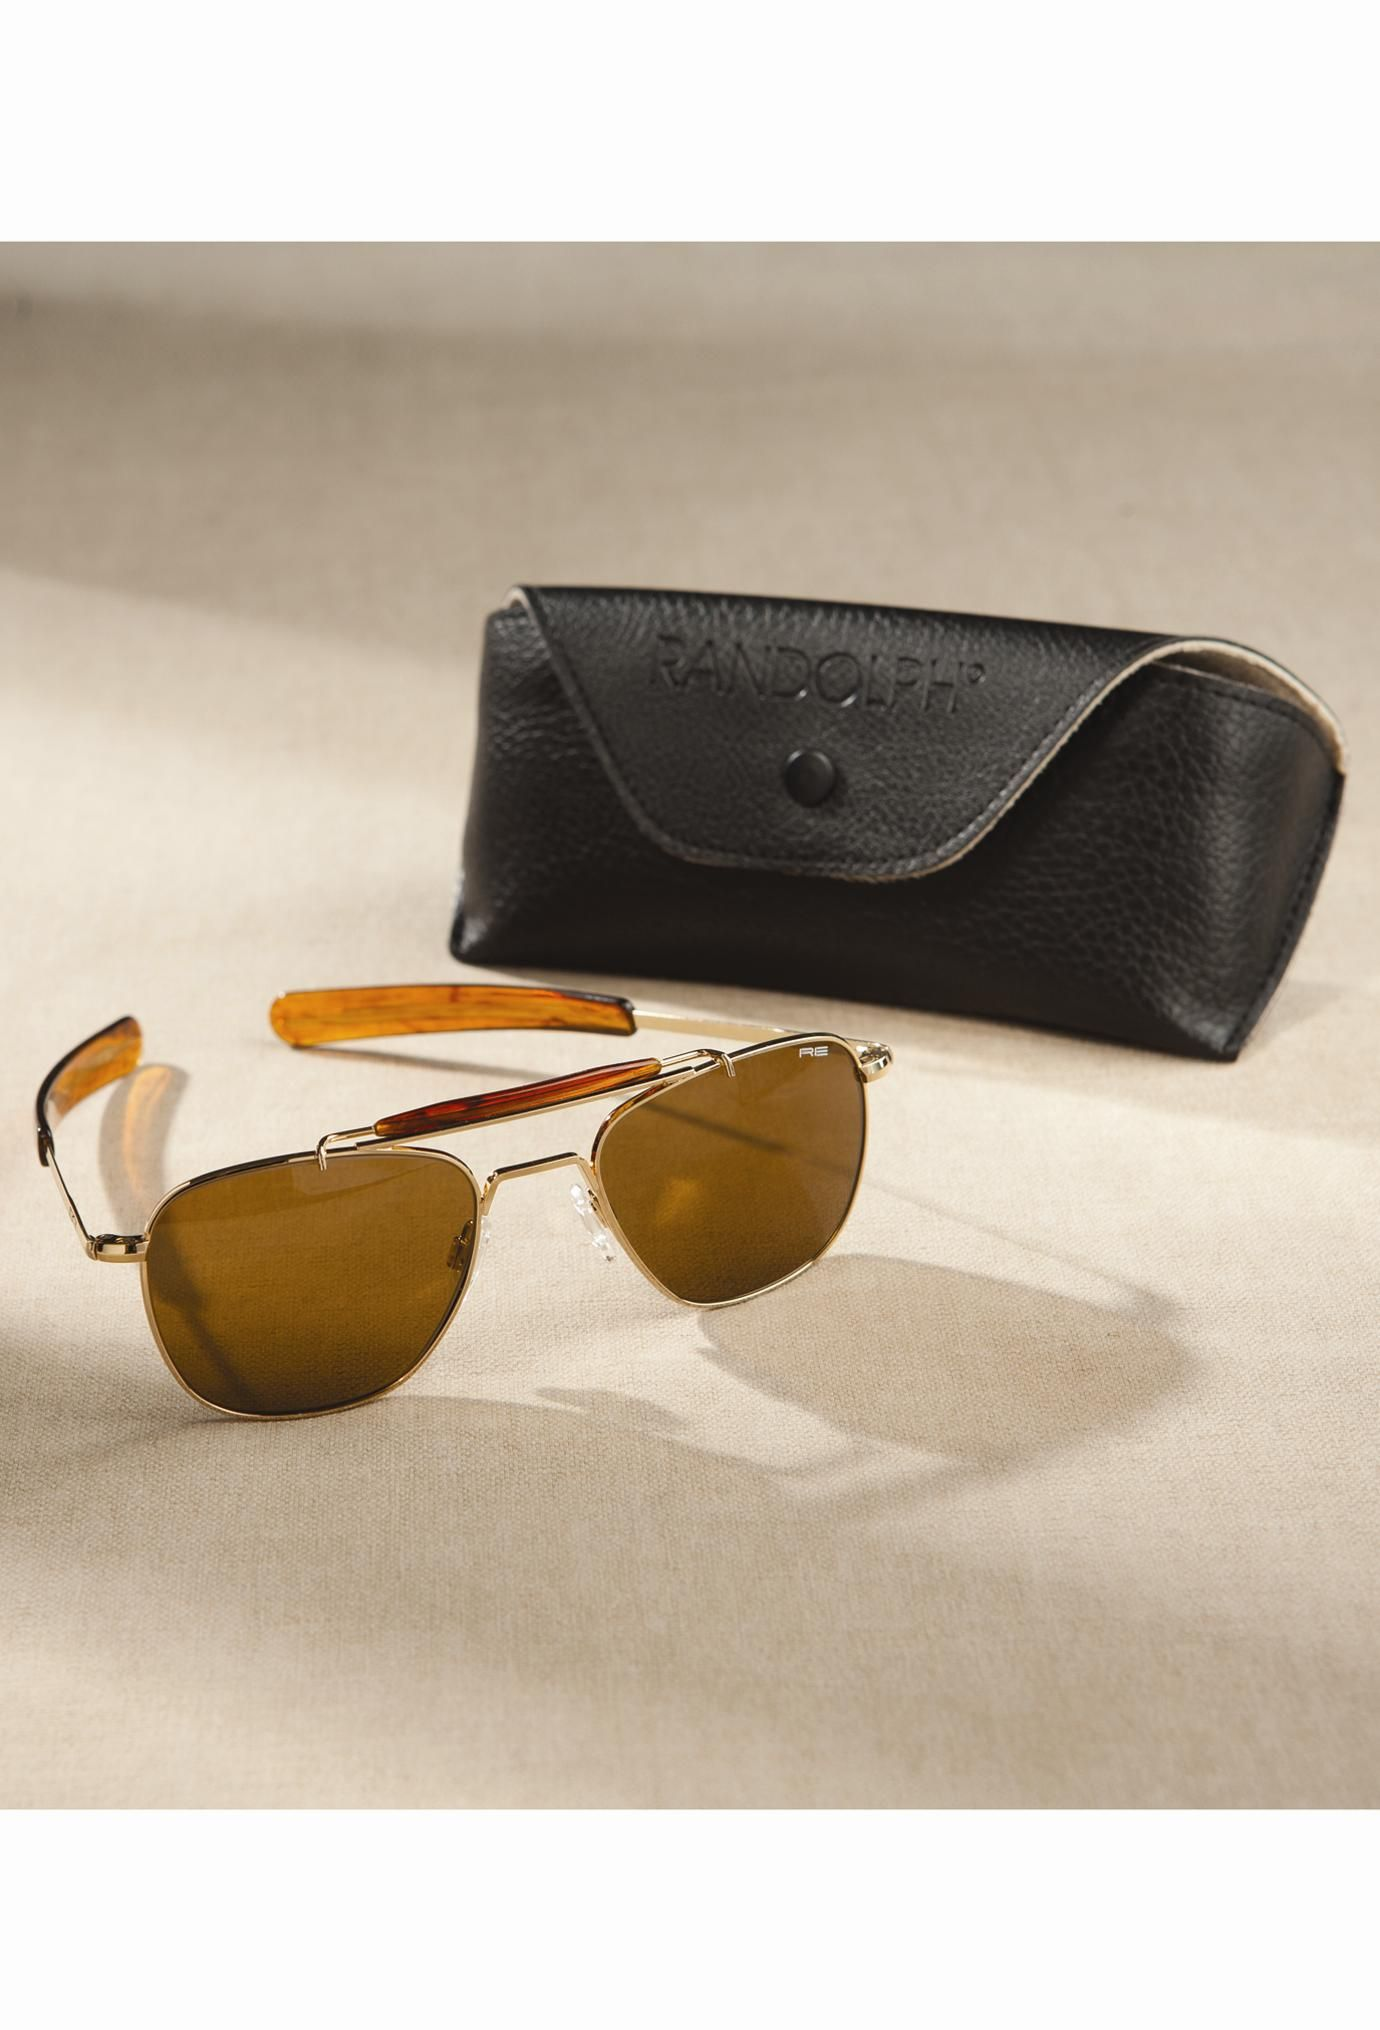 1d0b8cf85d Aviator Sunglasses From Randolph Engineering   Territory Ahead Gafas De Sol,  Lentes, Hombres Con